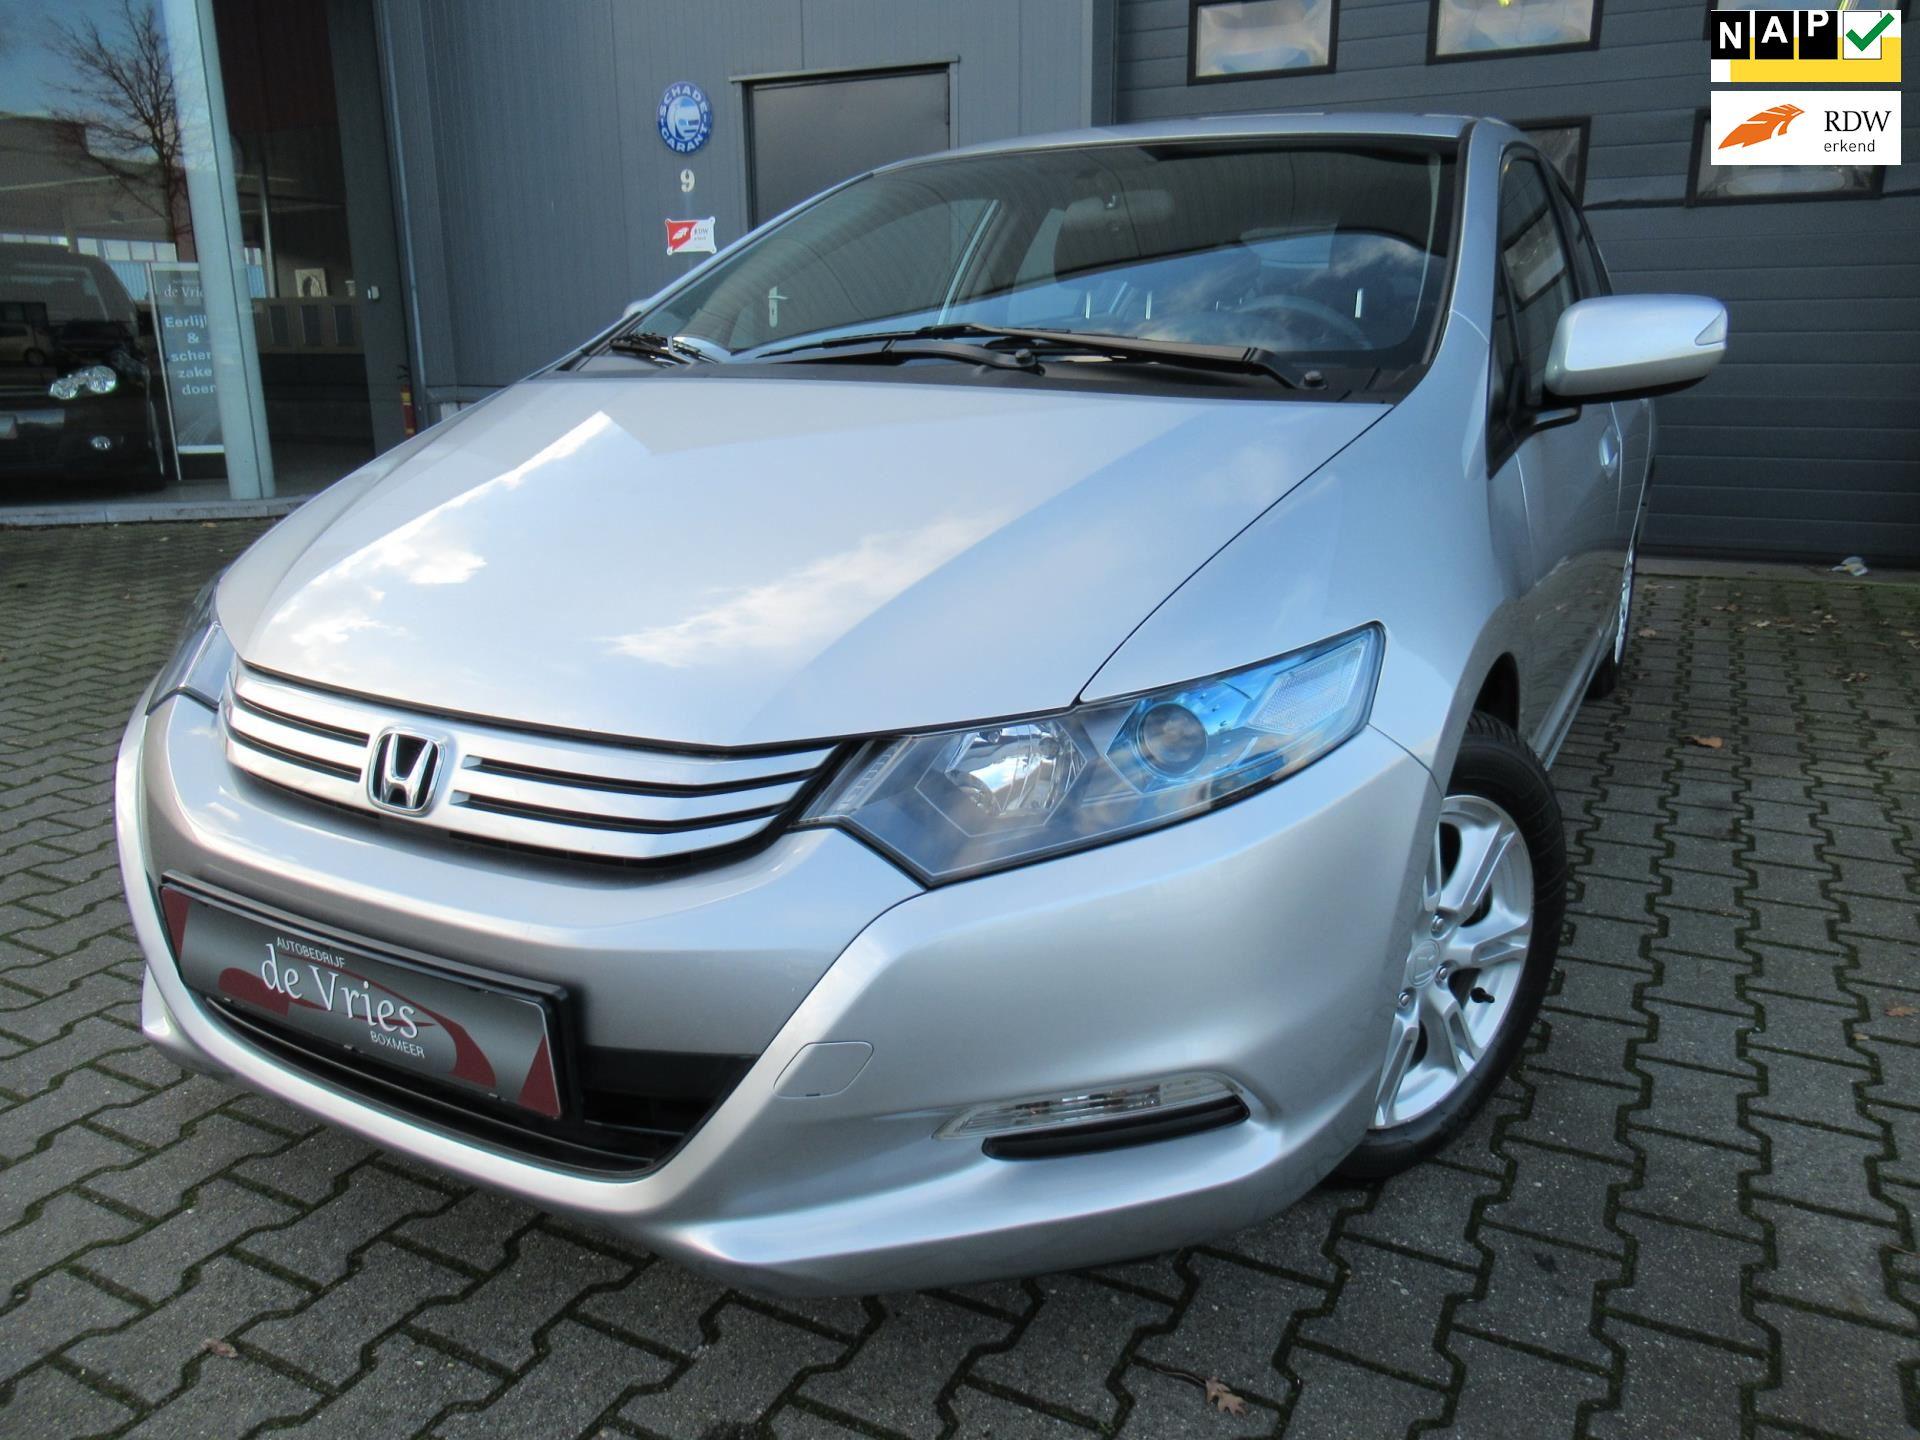 Honda Insight occasion - Autobedrijf de Vries Boxmeer